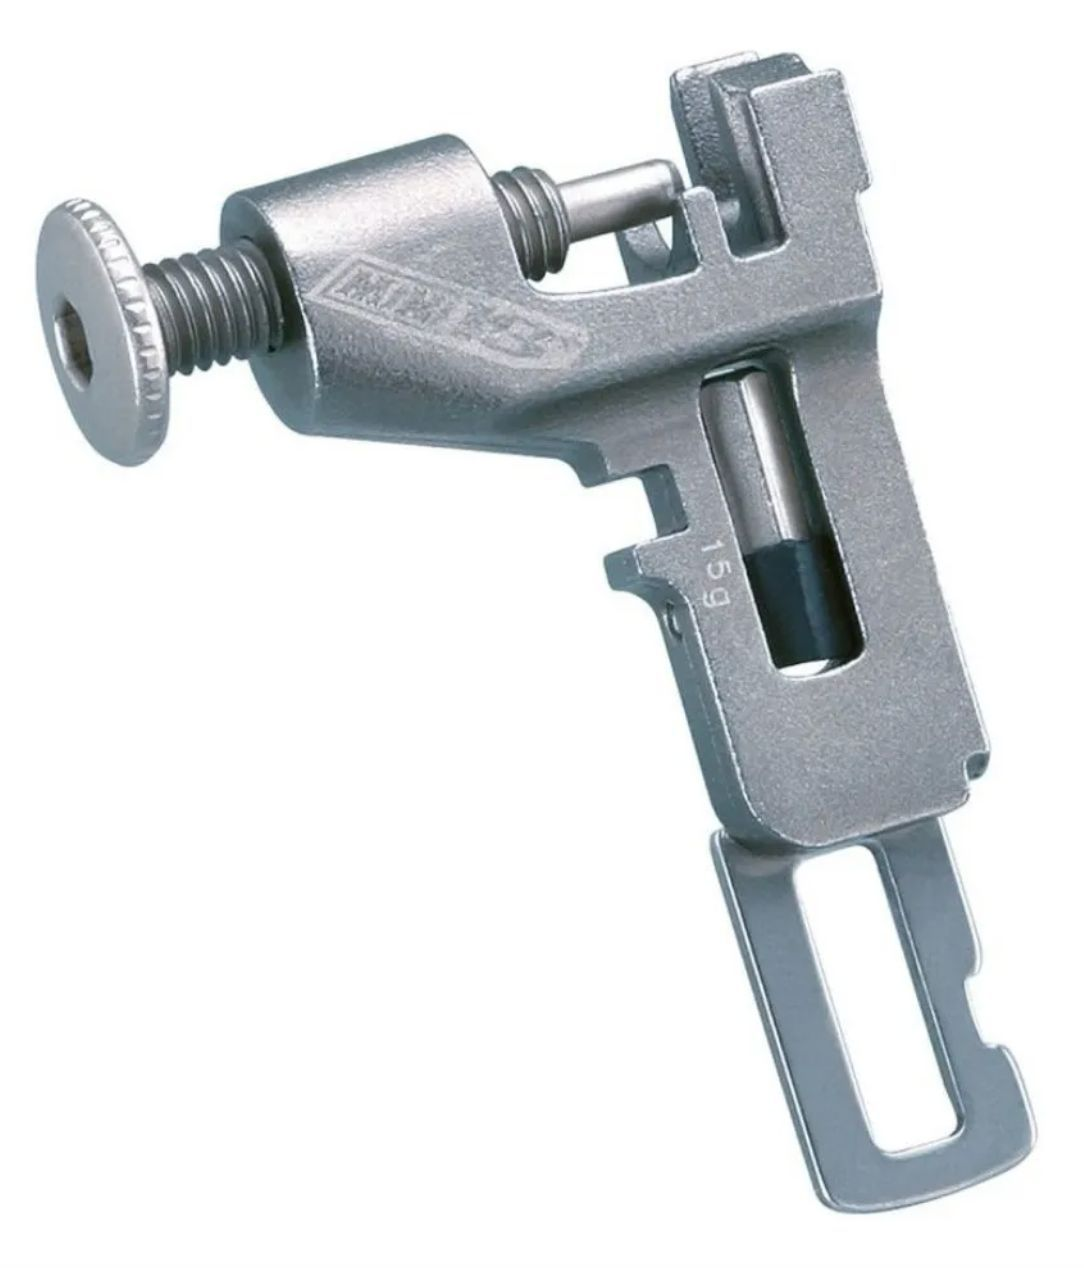 Canivete Kit Ferramenta Topeak Mini 18+ Chave De Corrente